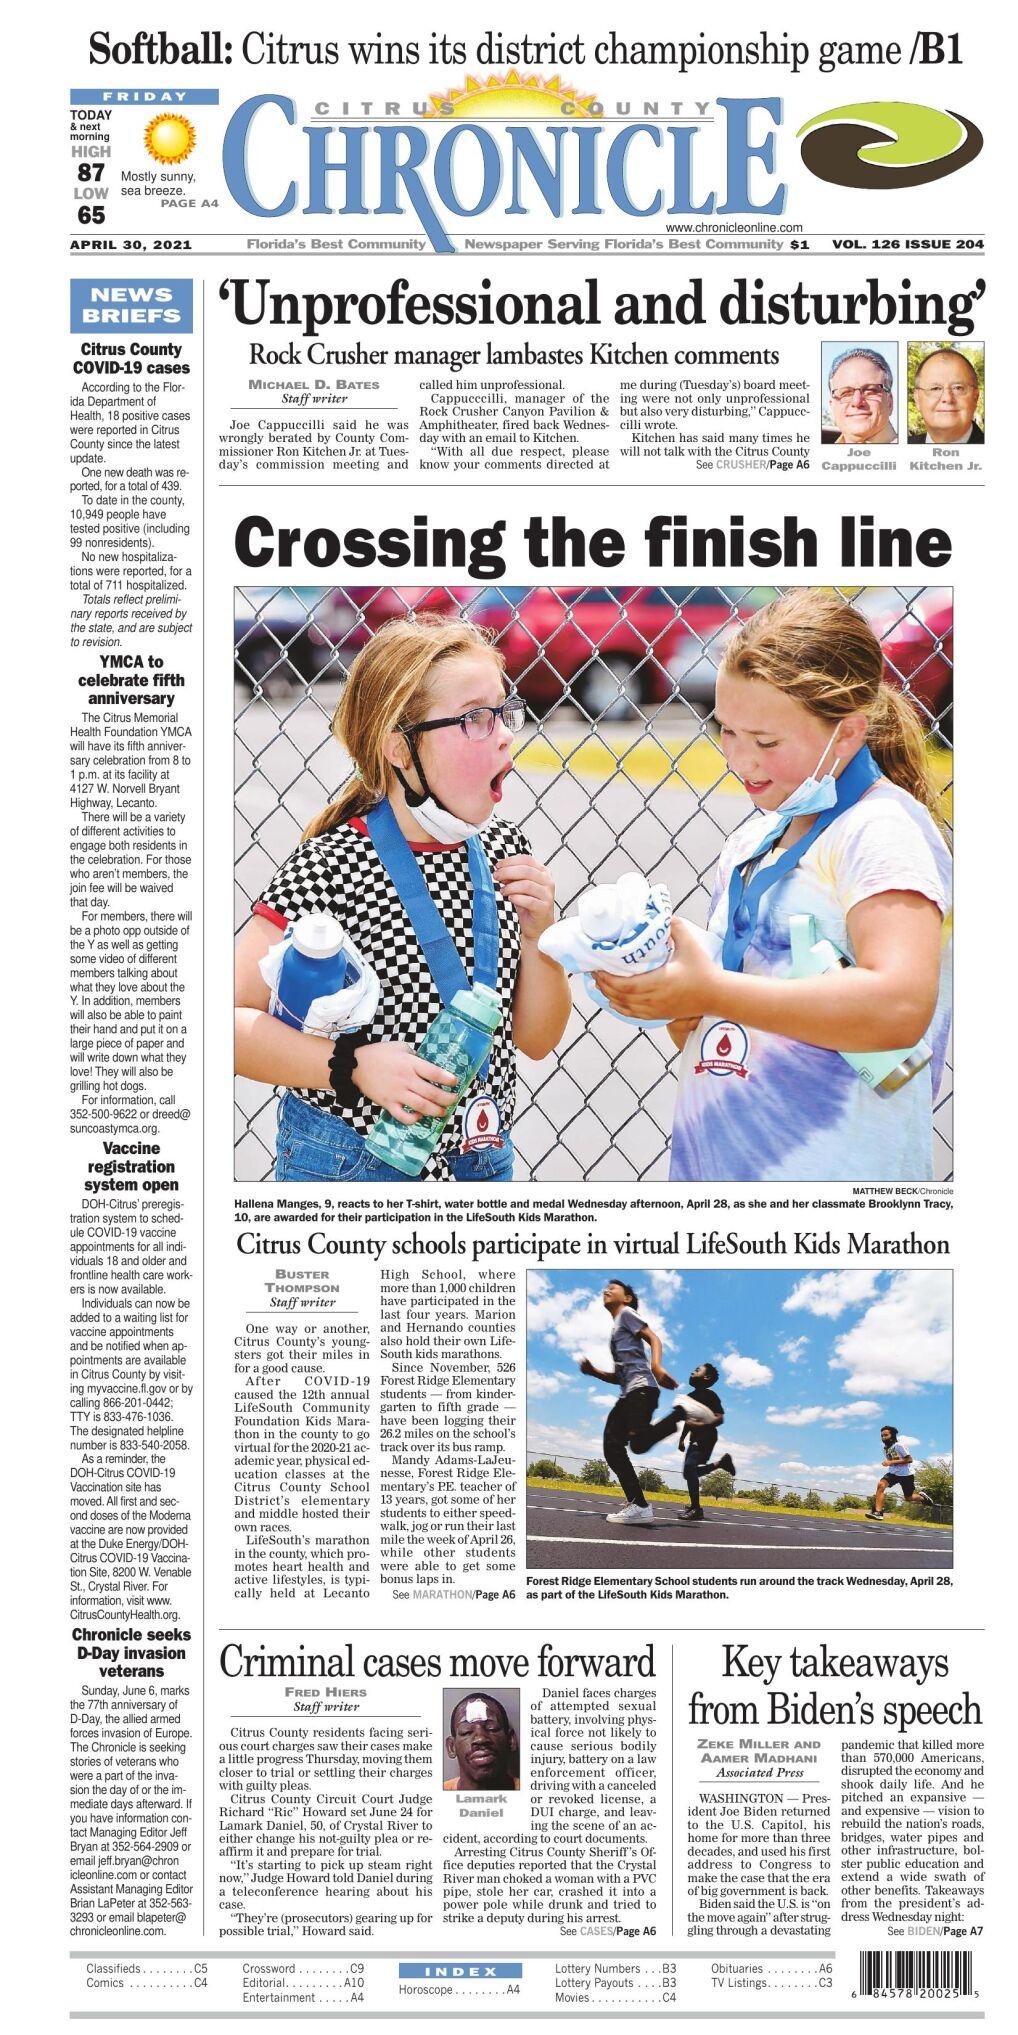 Citrus County Chronicle e edition Apr 30, 2021